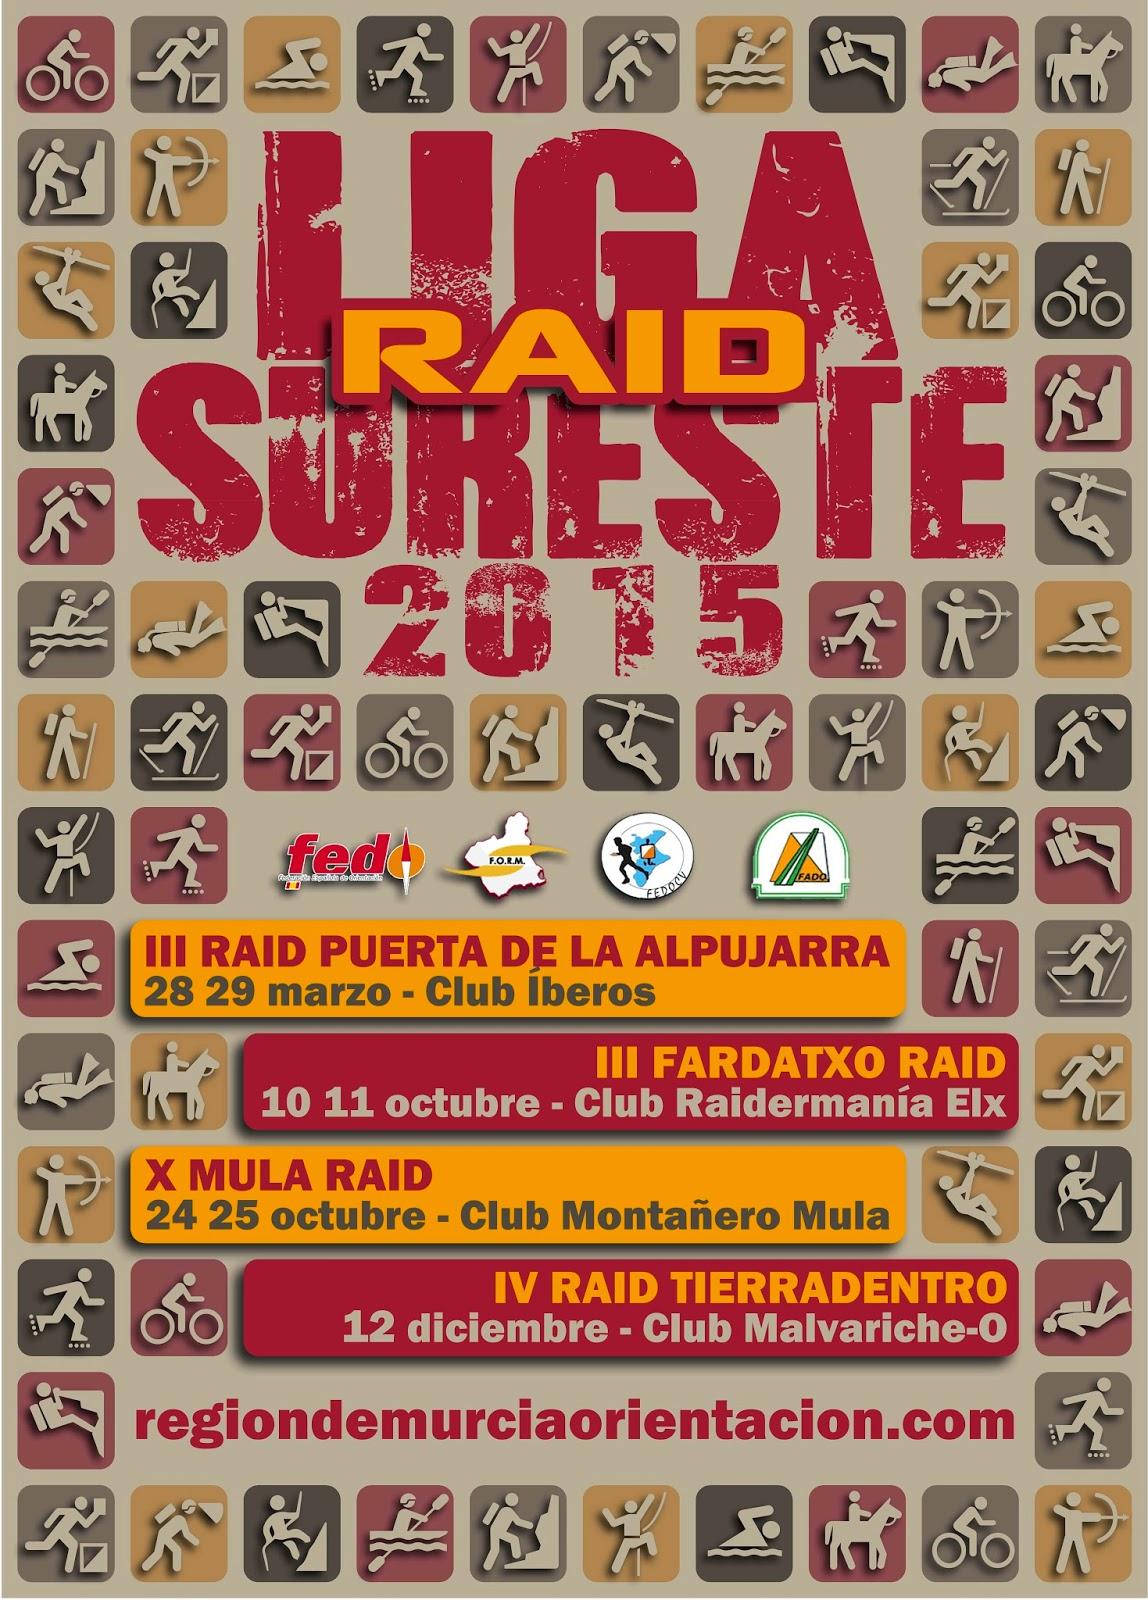 Liga del sureste de Raid 2015